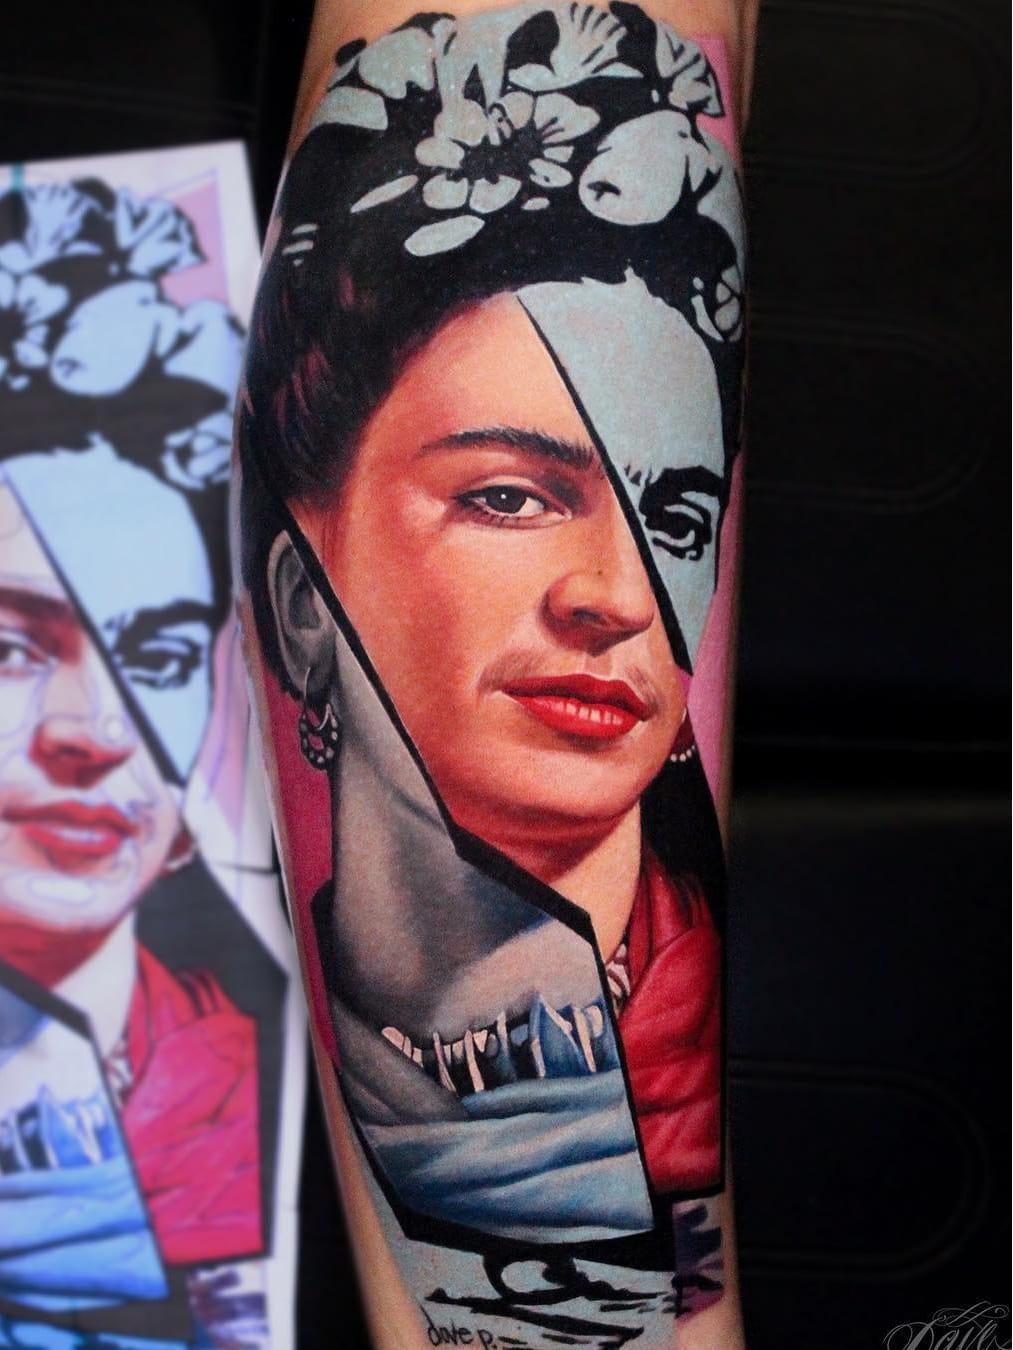 #DavePaulo #gringo #realismo #realism #colorido #colorful #portrait #retrato #colagem #collage #woman #mulher #fridakahlo #flor #flower #pretoebranco #blackandwhite #illustrative #ilustrativo